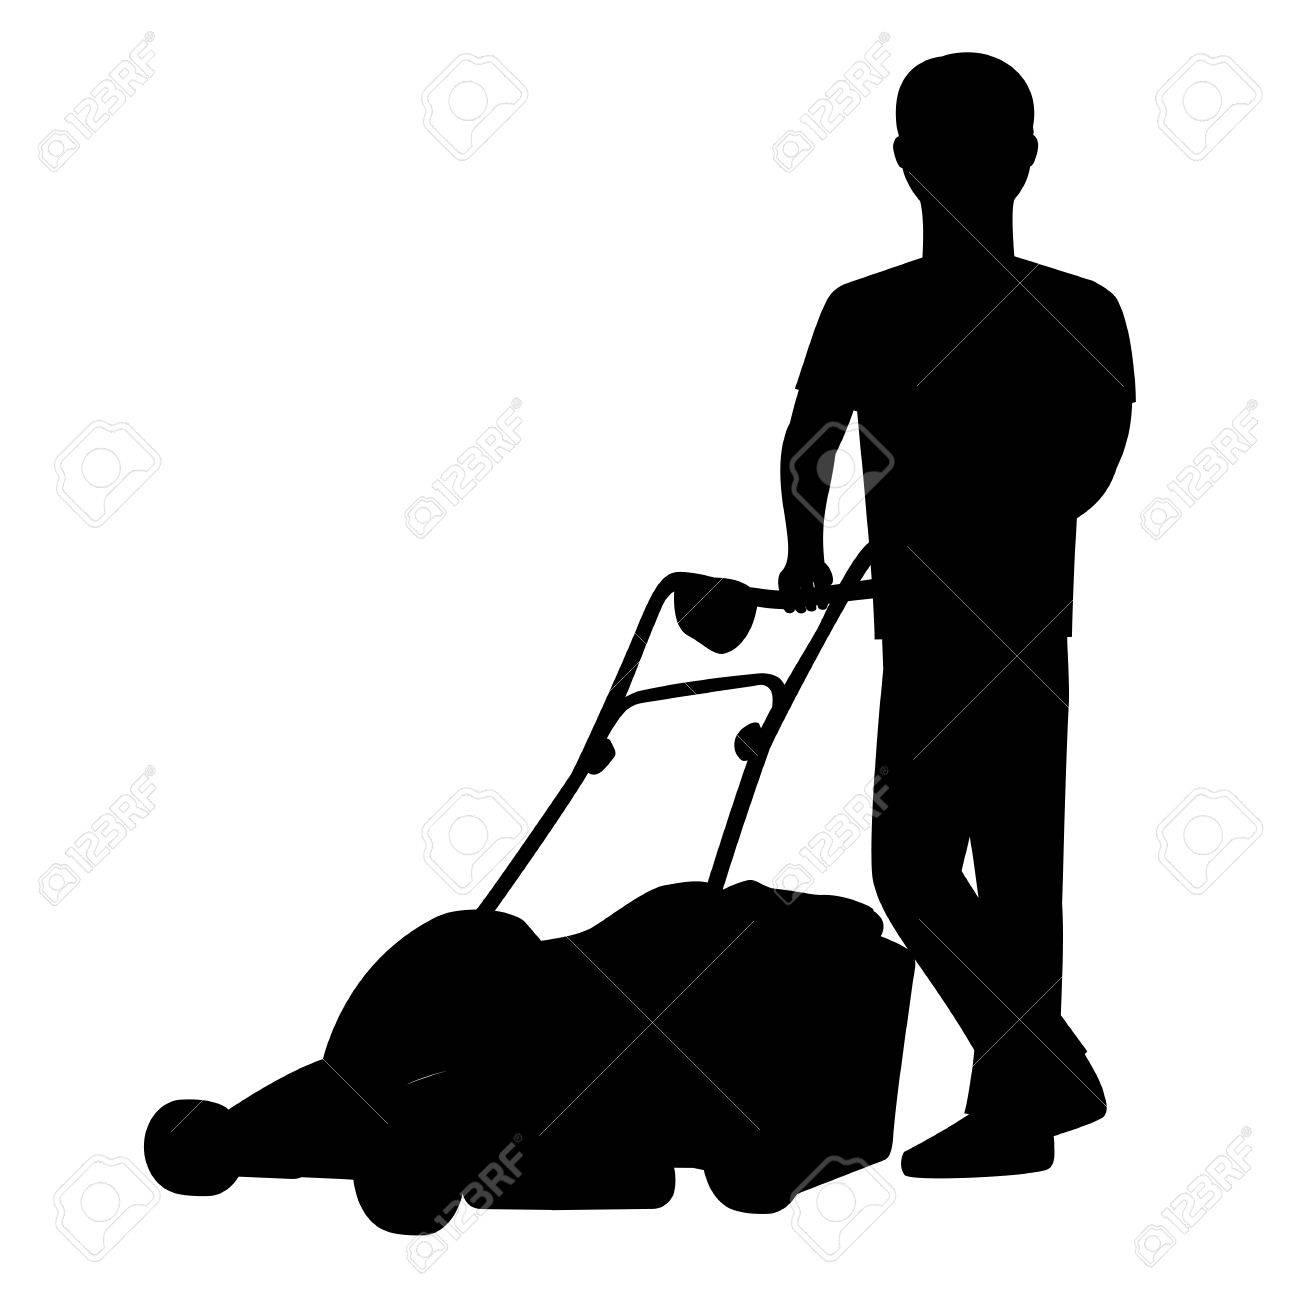 man cutting the grass with lawn mower vector silhouette graphic rh 123rf com Yard Maintenance Clip Art yard work clipart